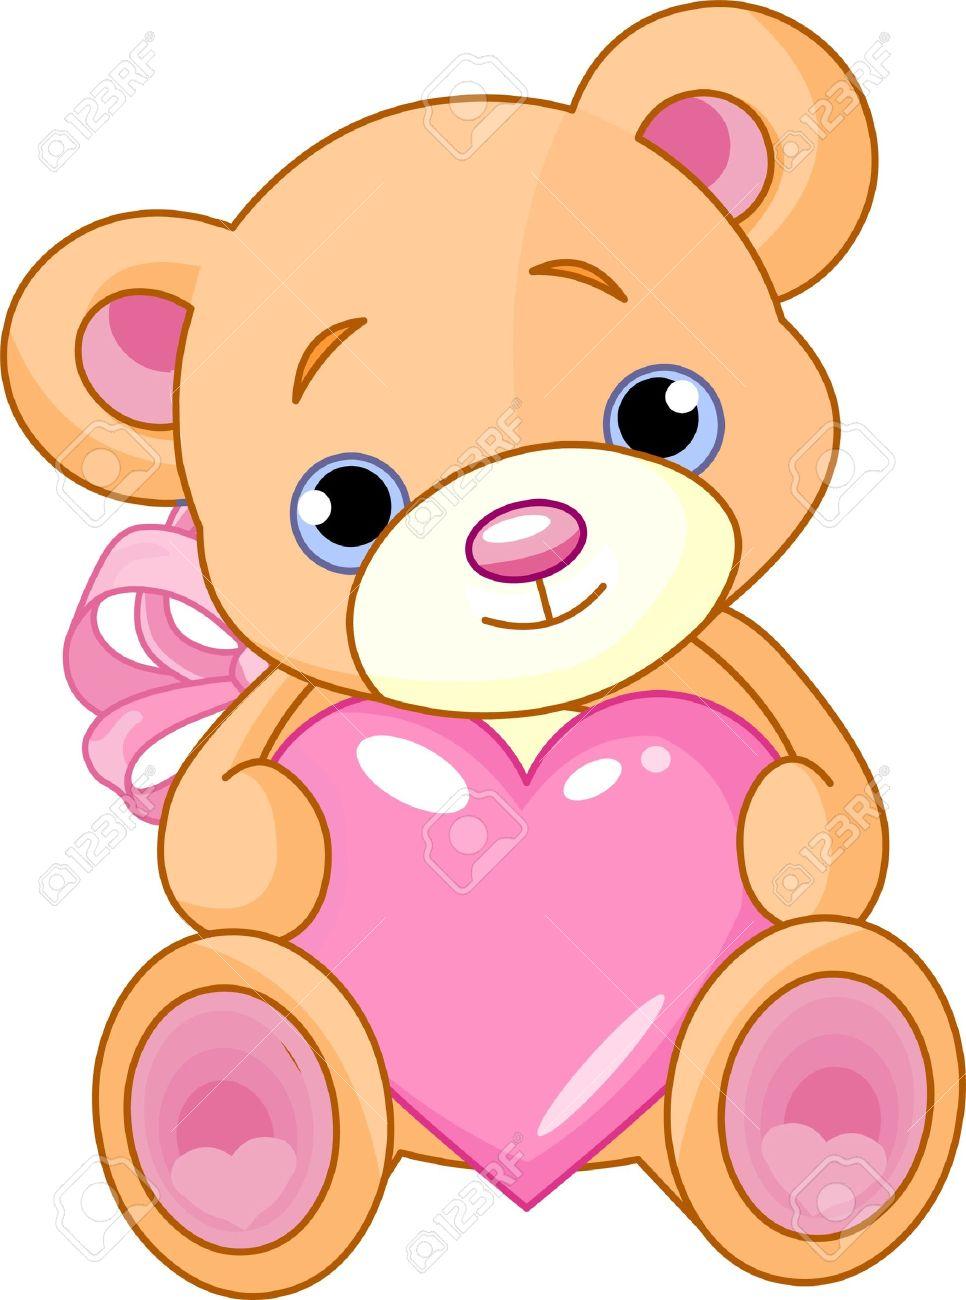 Uncategorized How To Draw A Cartoon Teddy Bear illustration of cute little teddy bear holding pink heart royalty stock vector 7628241